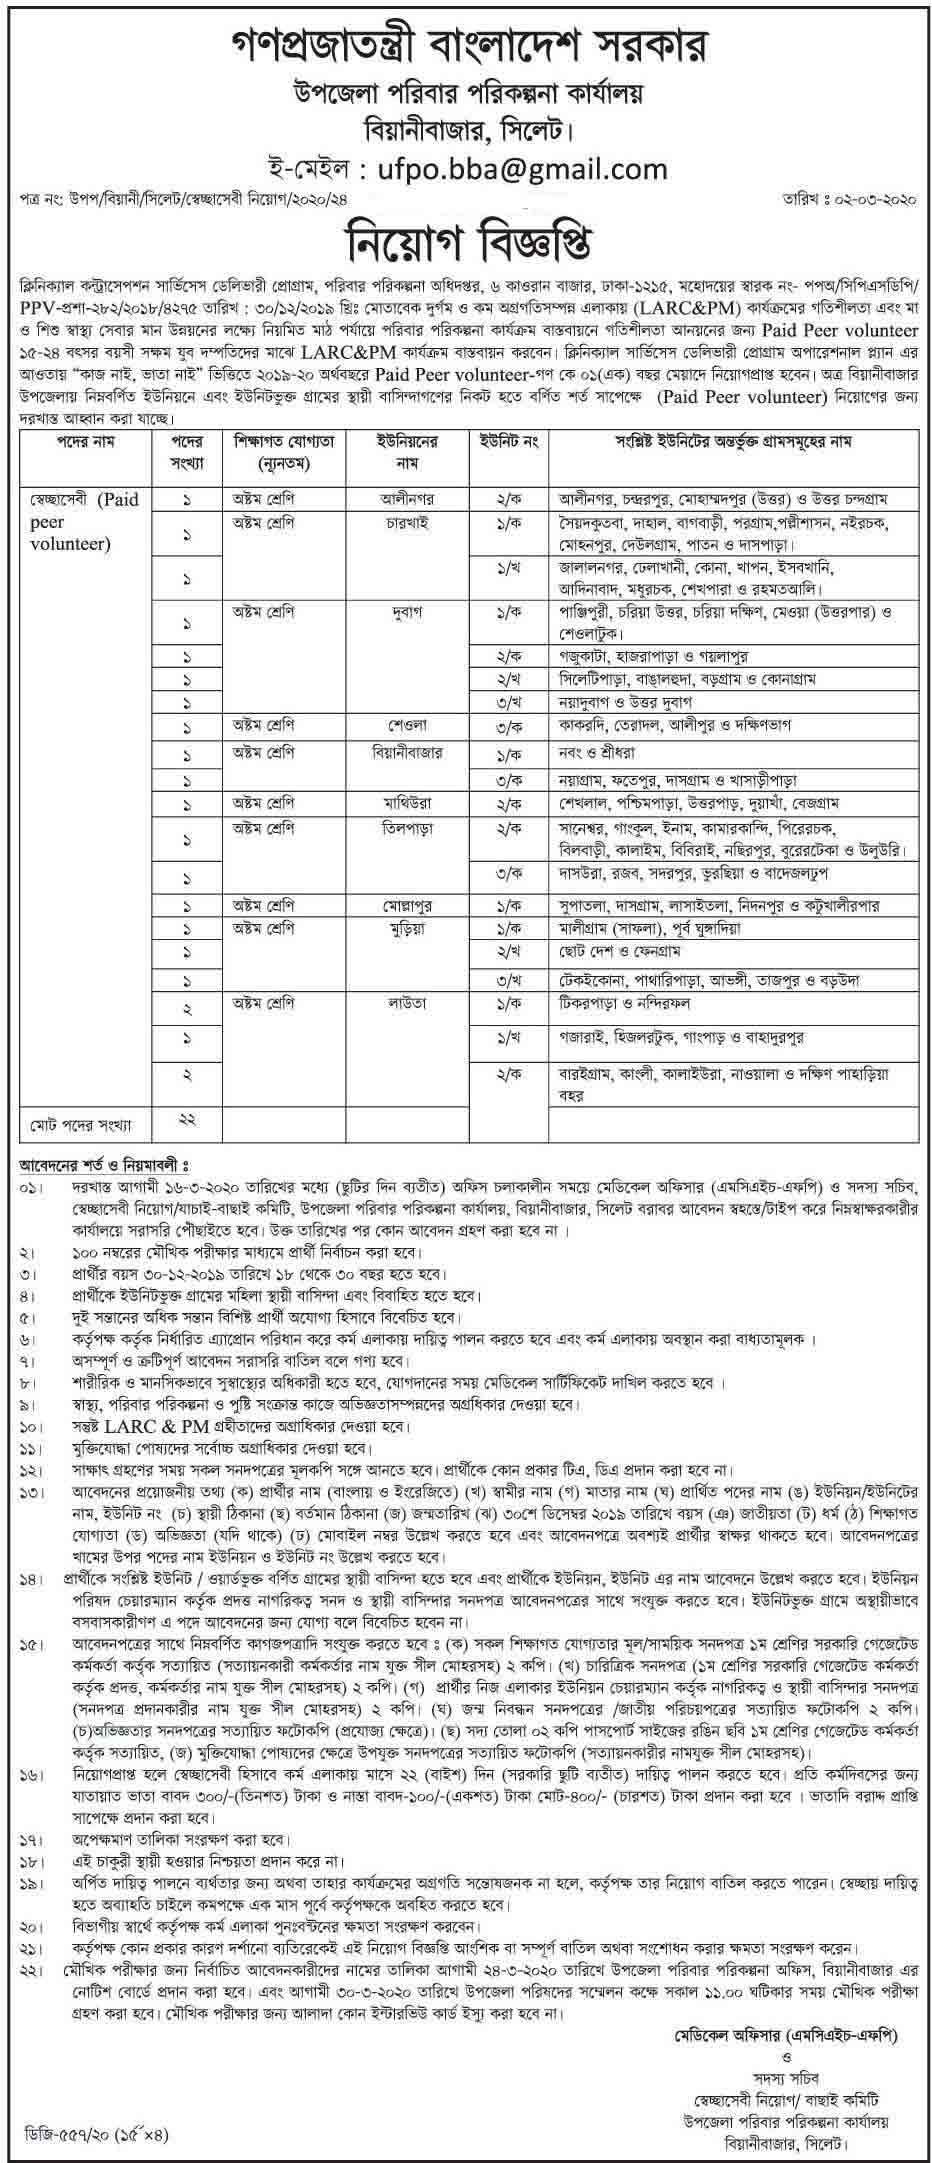 Upazila Family Planning Office Job Circular-2020 1